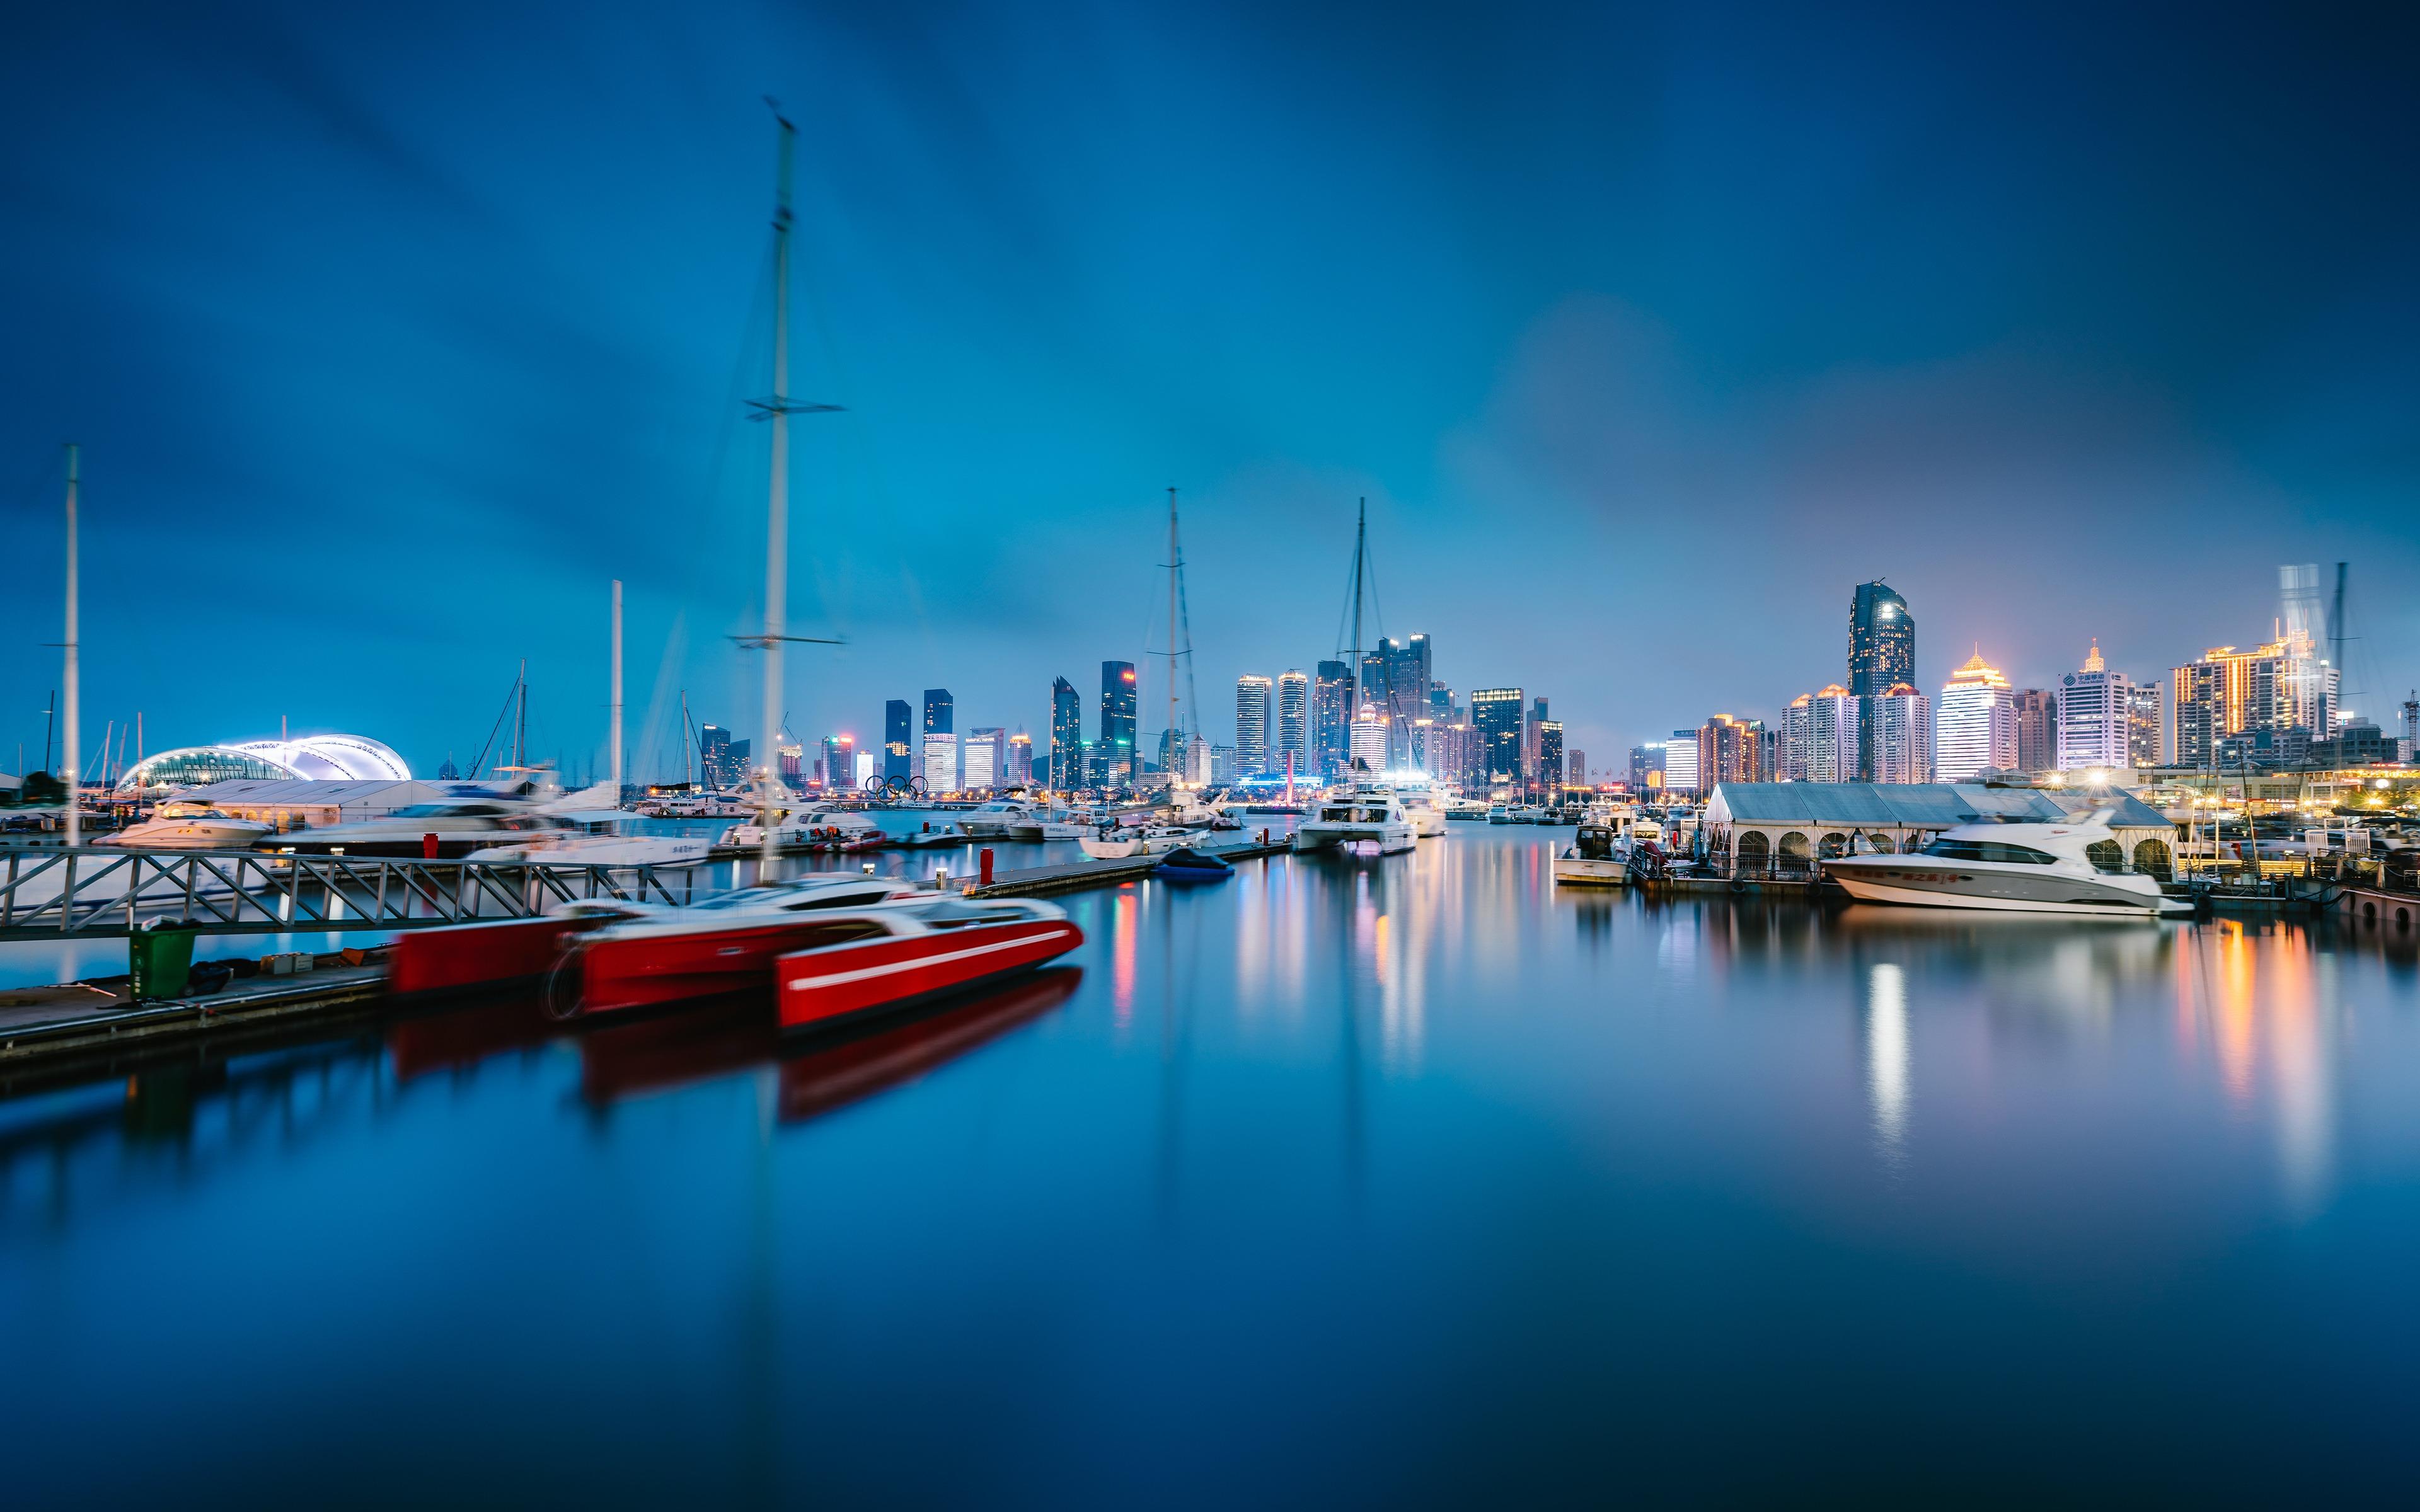 Capital City Auto >> China Sailing Capital Qingdao Harbor Night Preview   10wallpaper.com